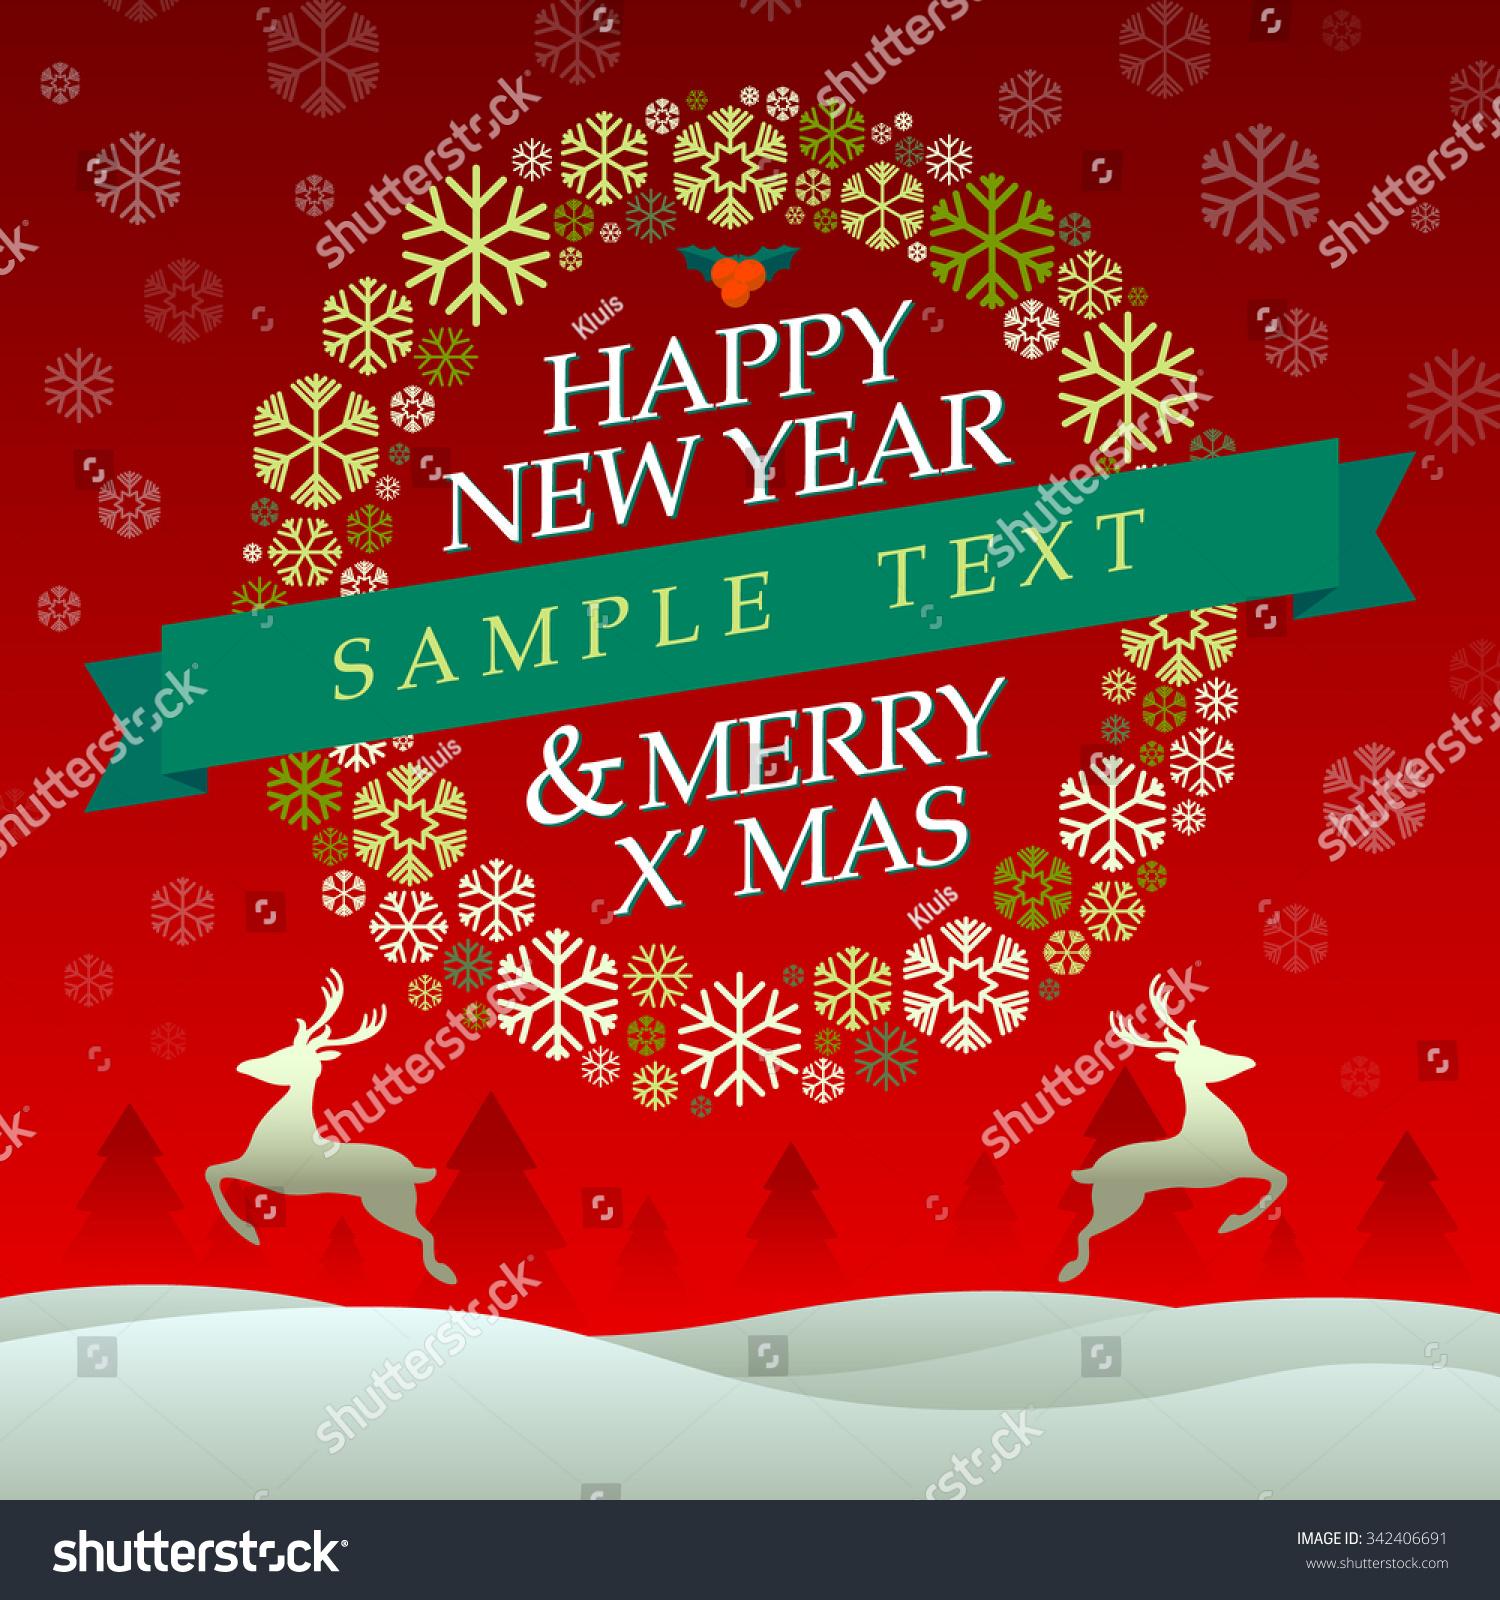 happy new year merry x mas vector stock vector (royalty free